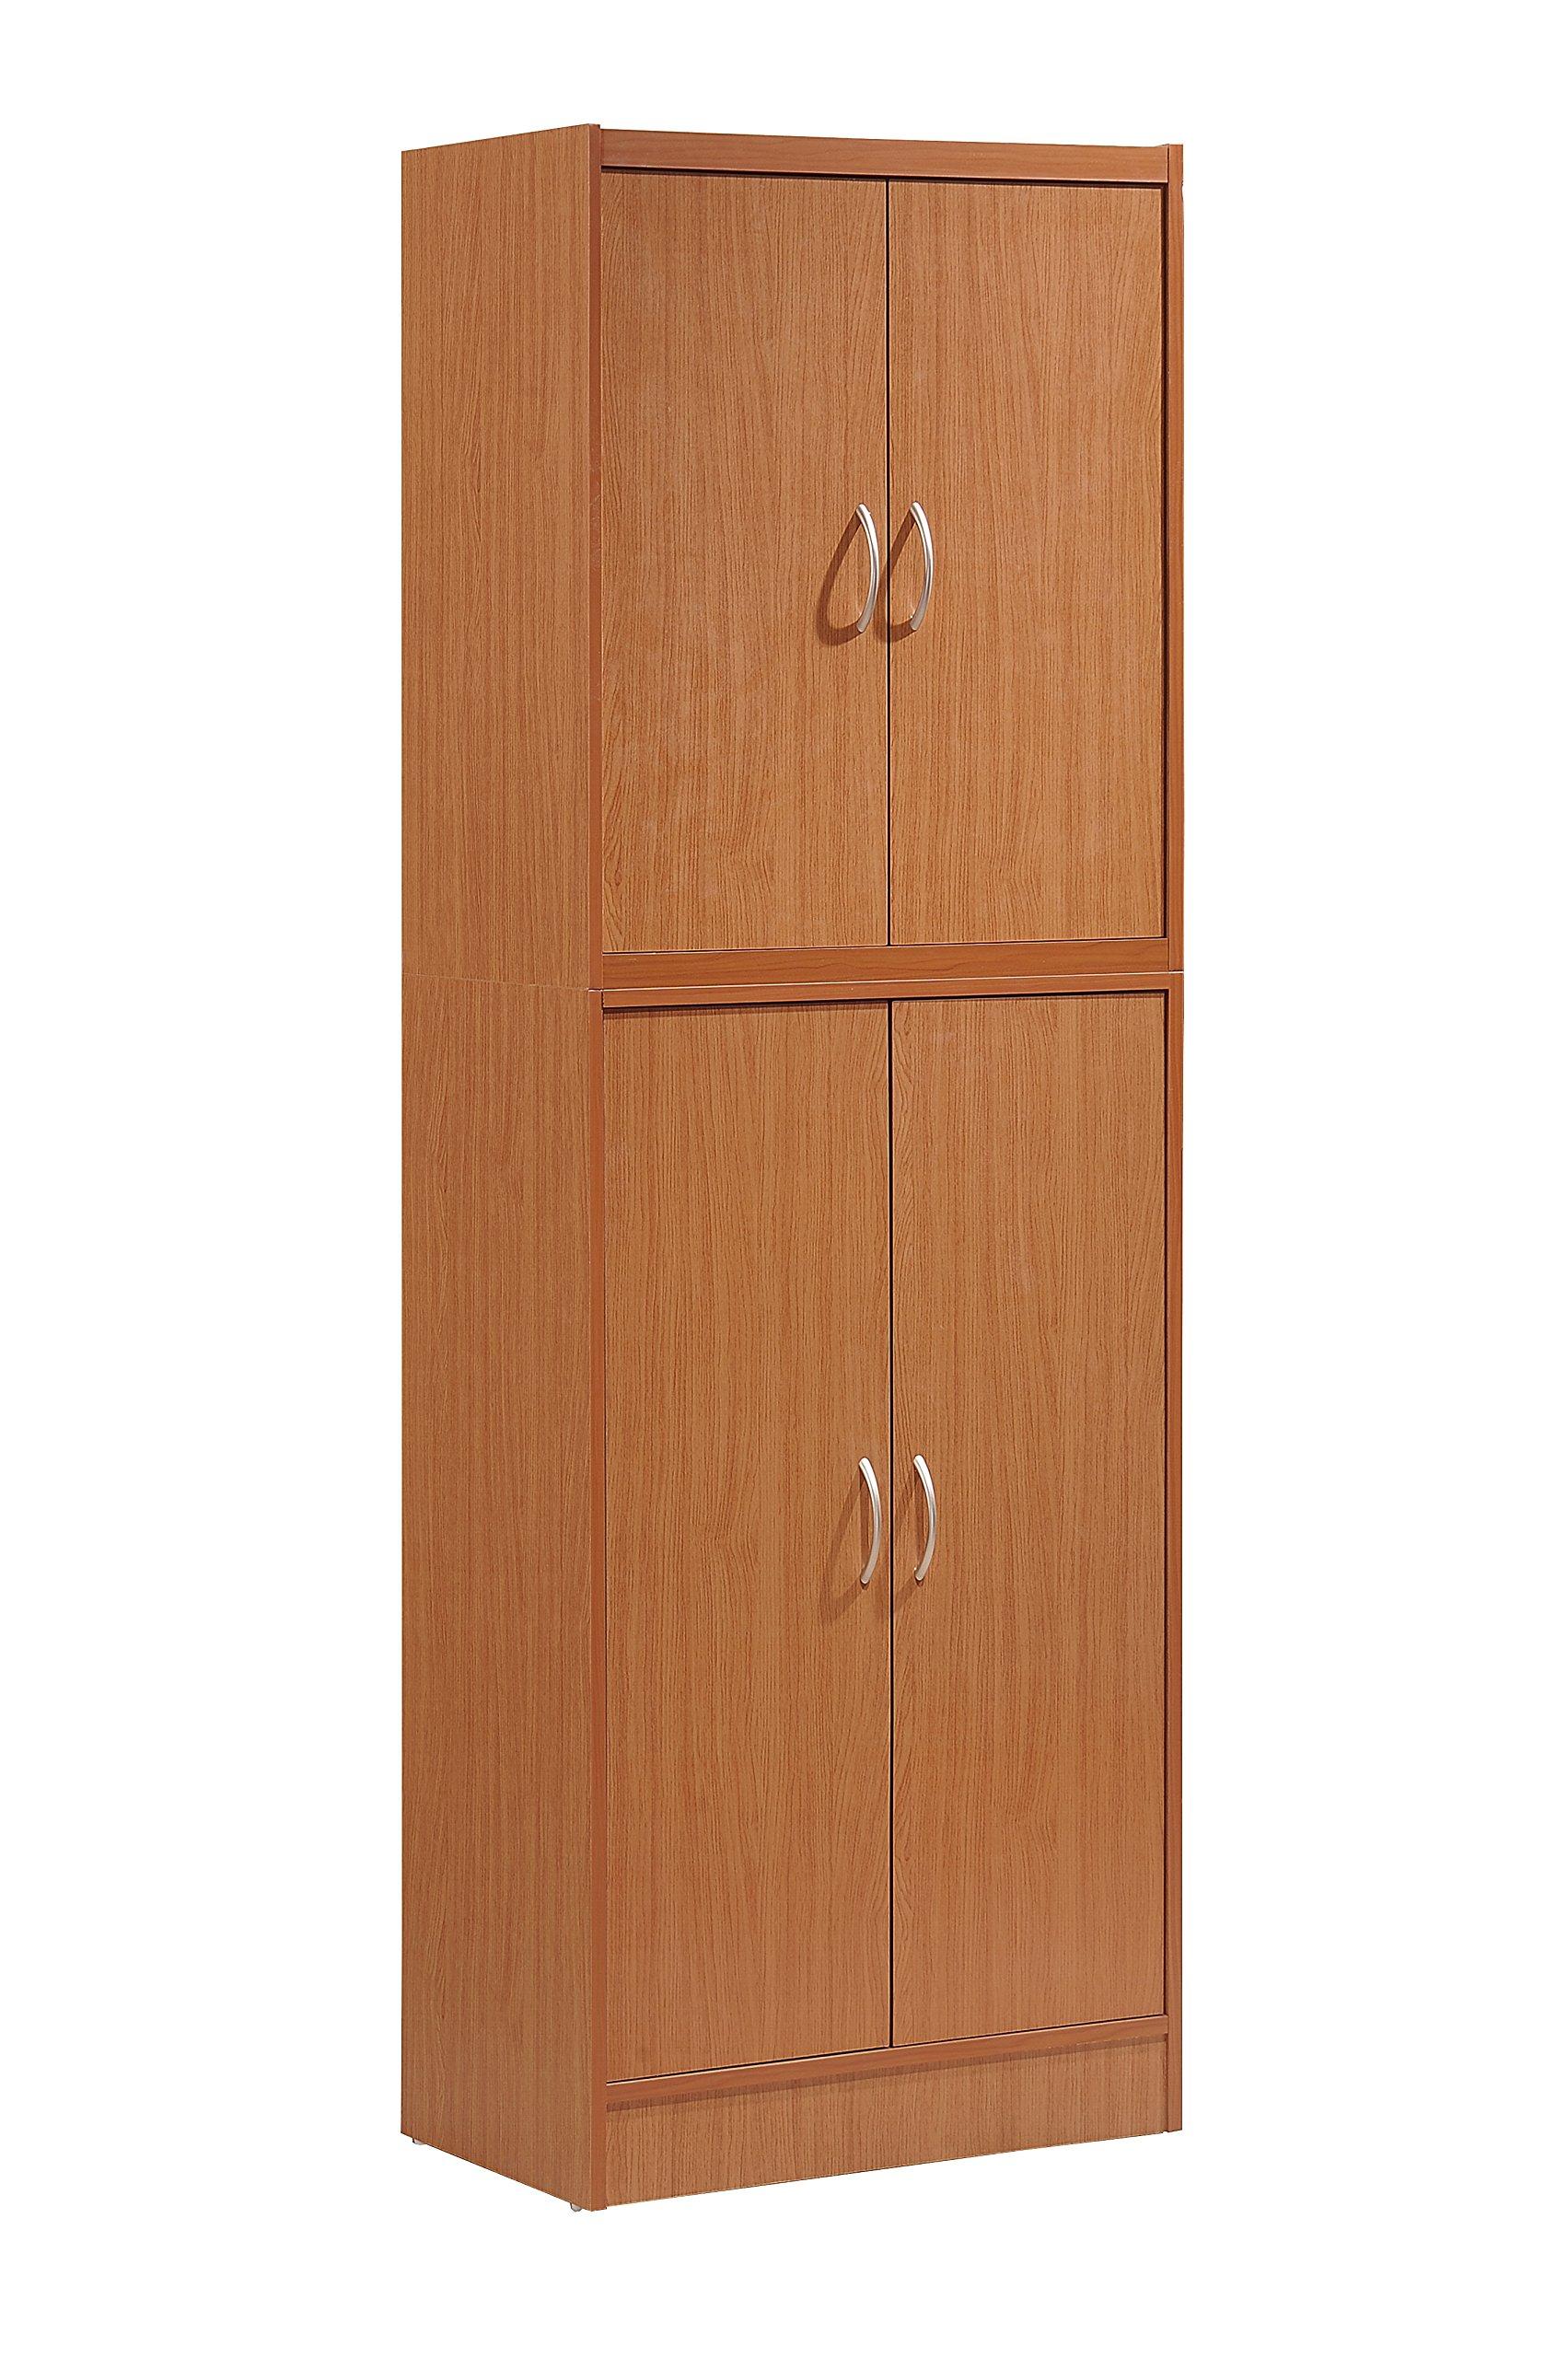 Hodedah 4 Door Kitchen Pantry with Four Shelves, Cherry by Hodedah